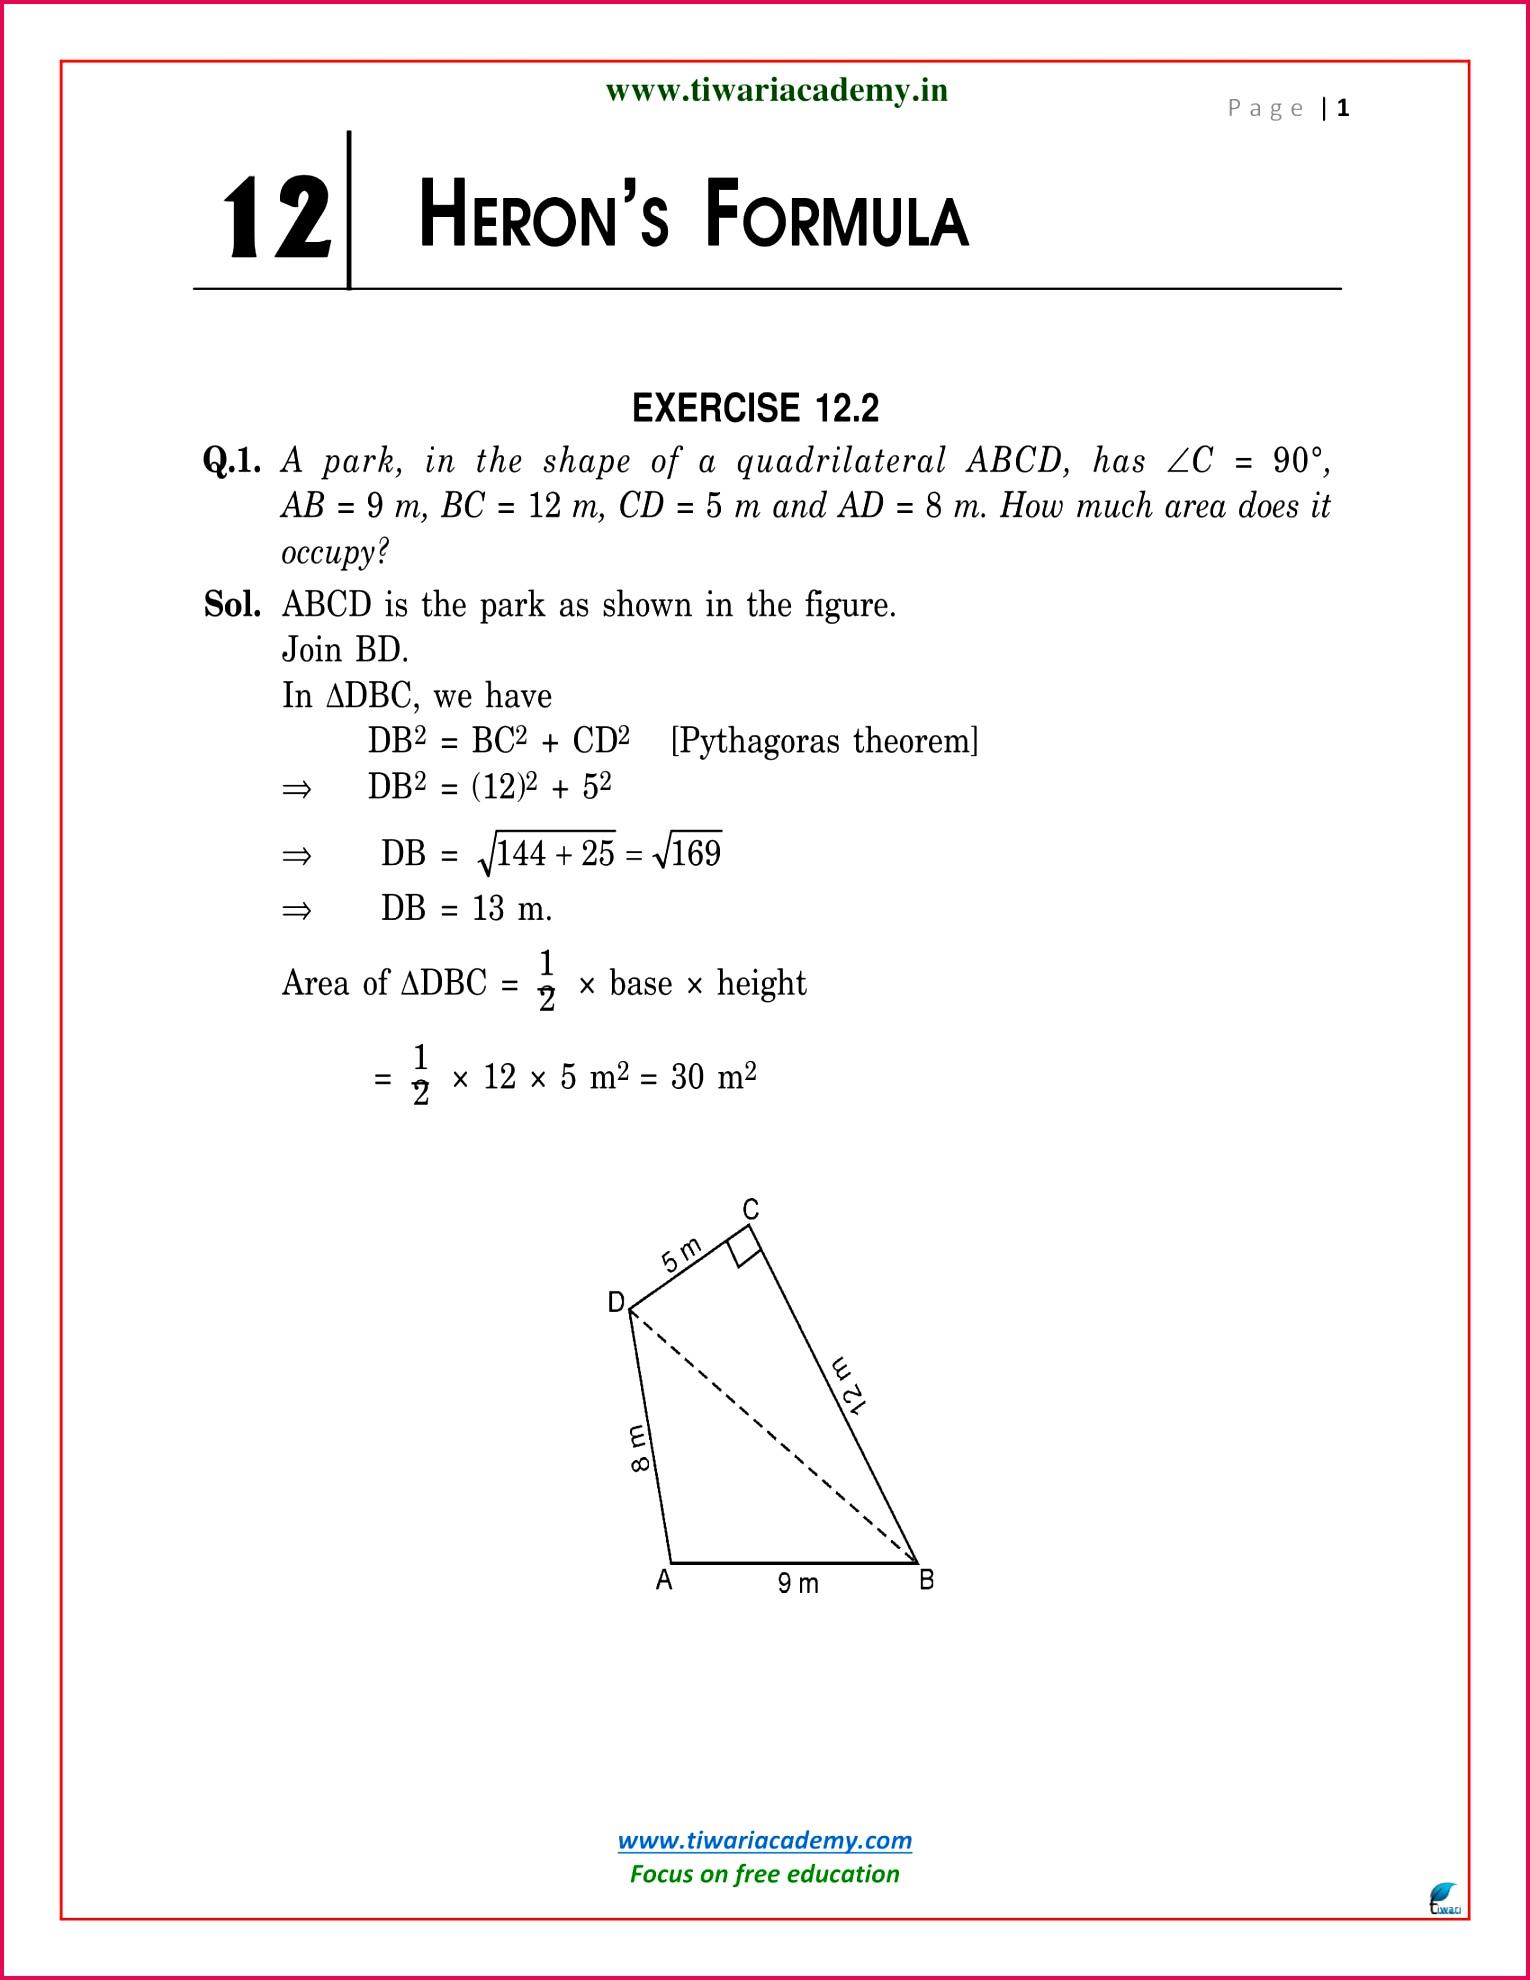 9 Maths NcertSolutions chapter 12 2 1